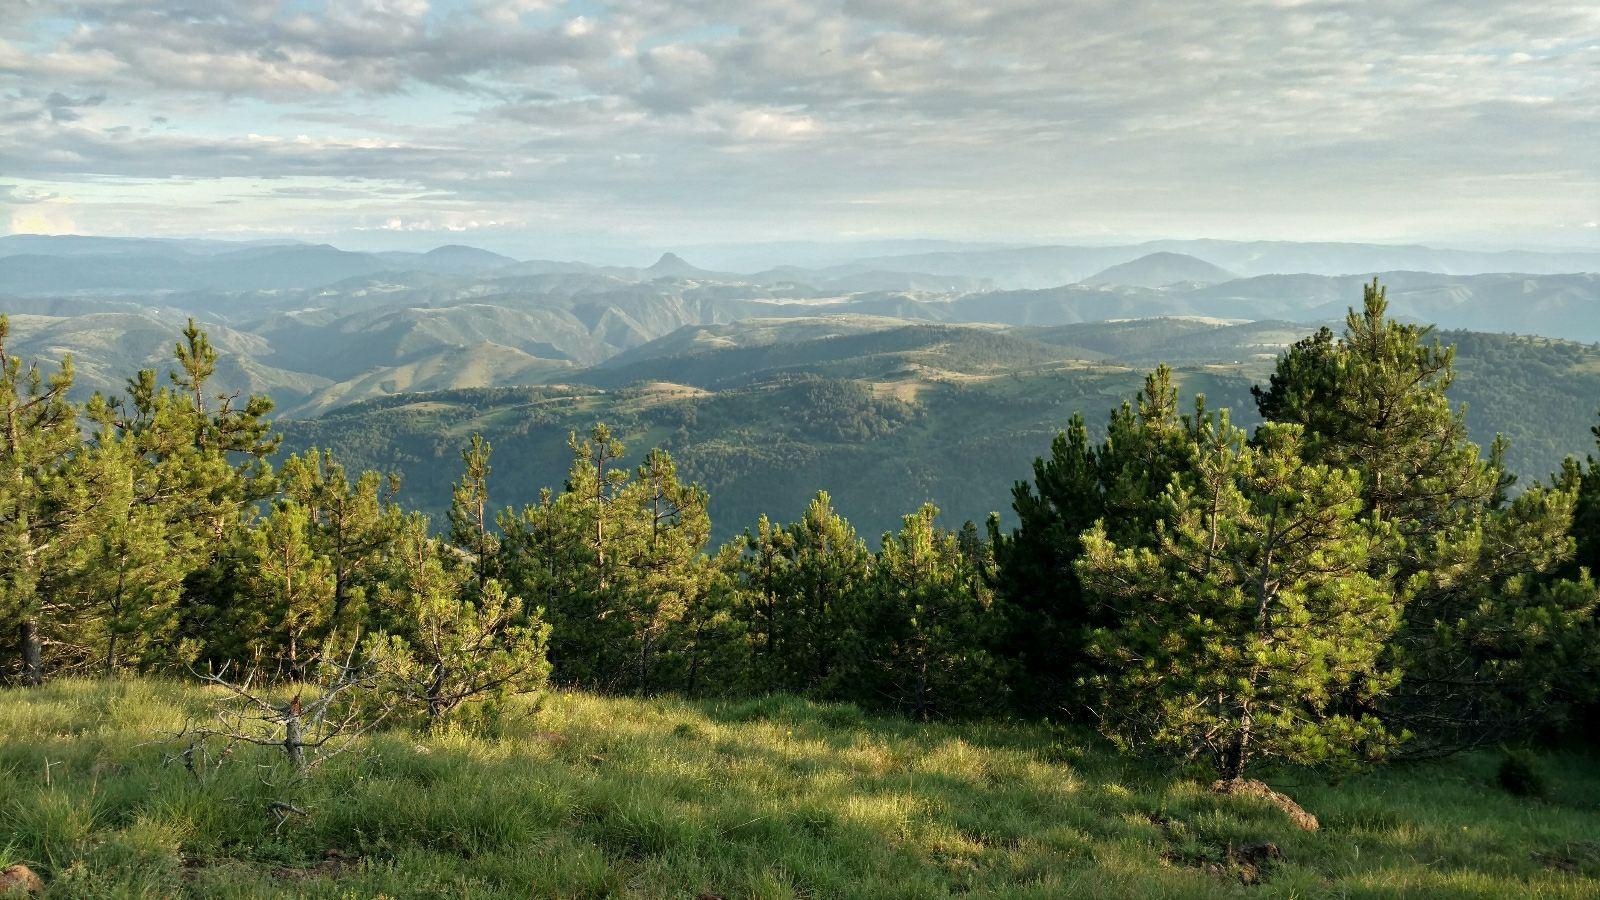 Tornik ridgehike, Via Dinarica Green Trail in Serbia